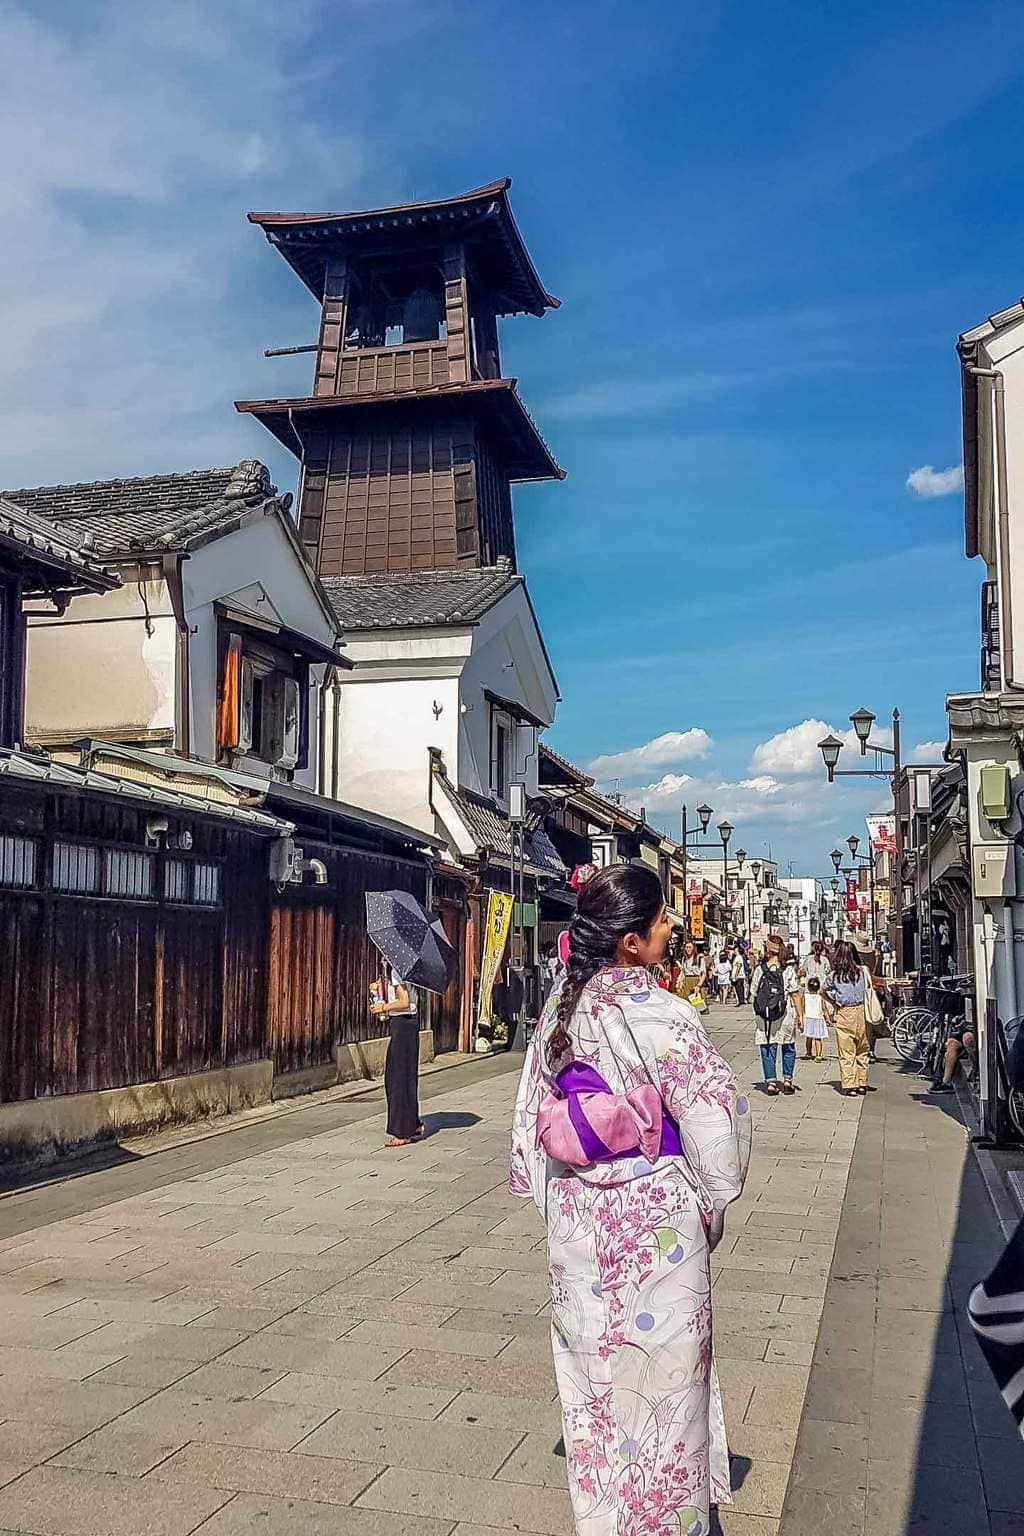 Things to do in Kawagoe - Clock Tower